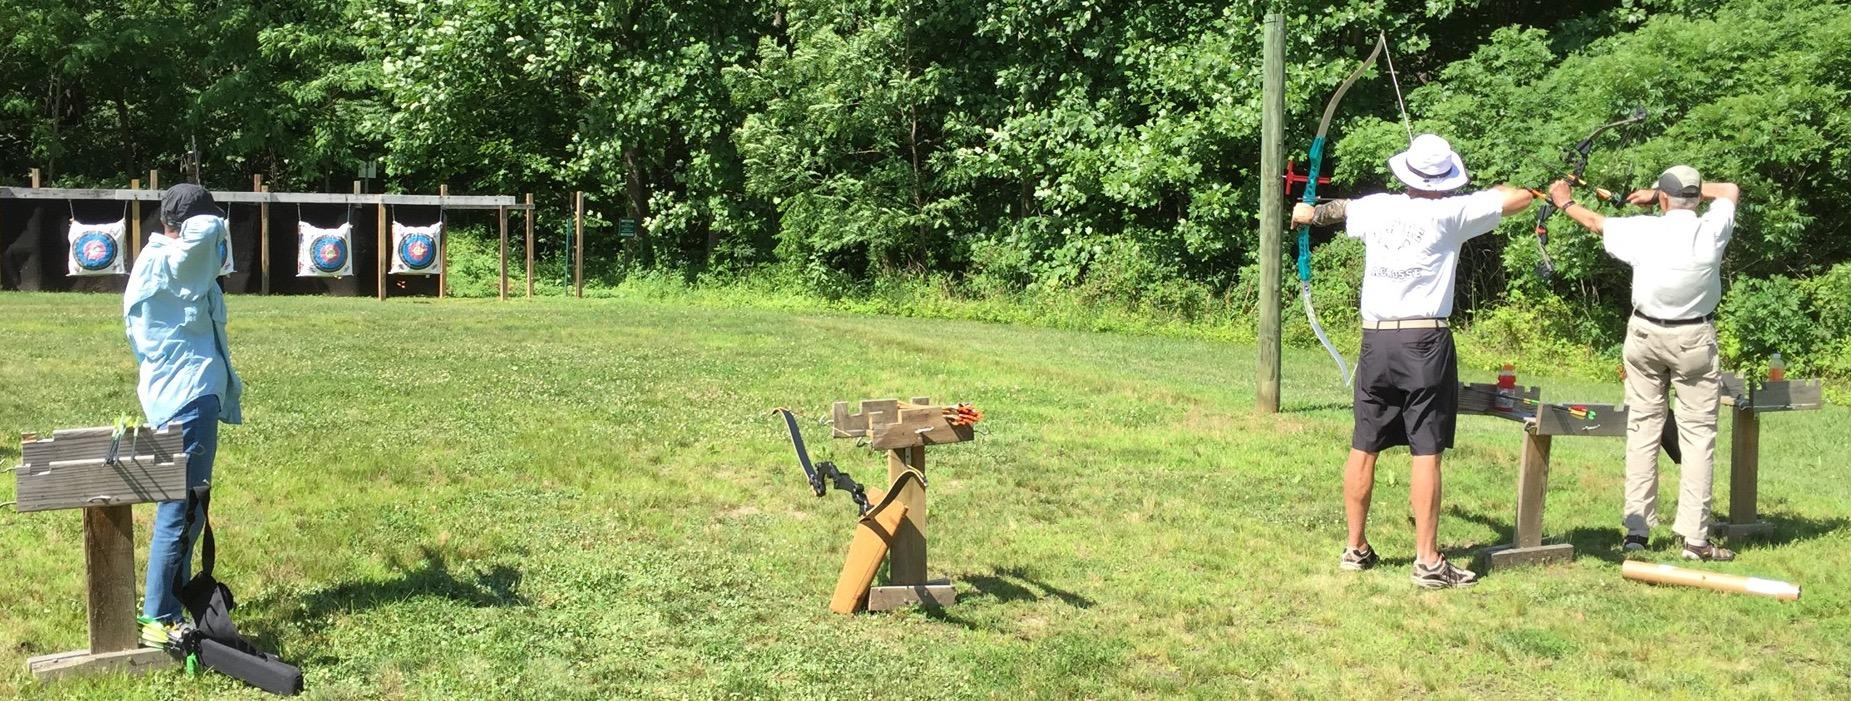 archery range Rodes farm 1.jpg